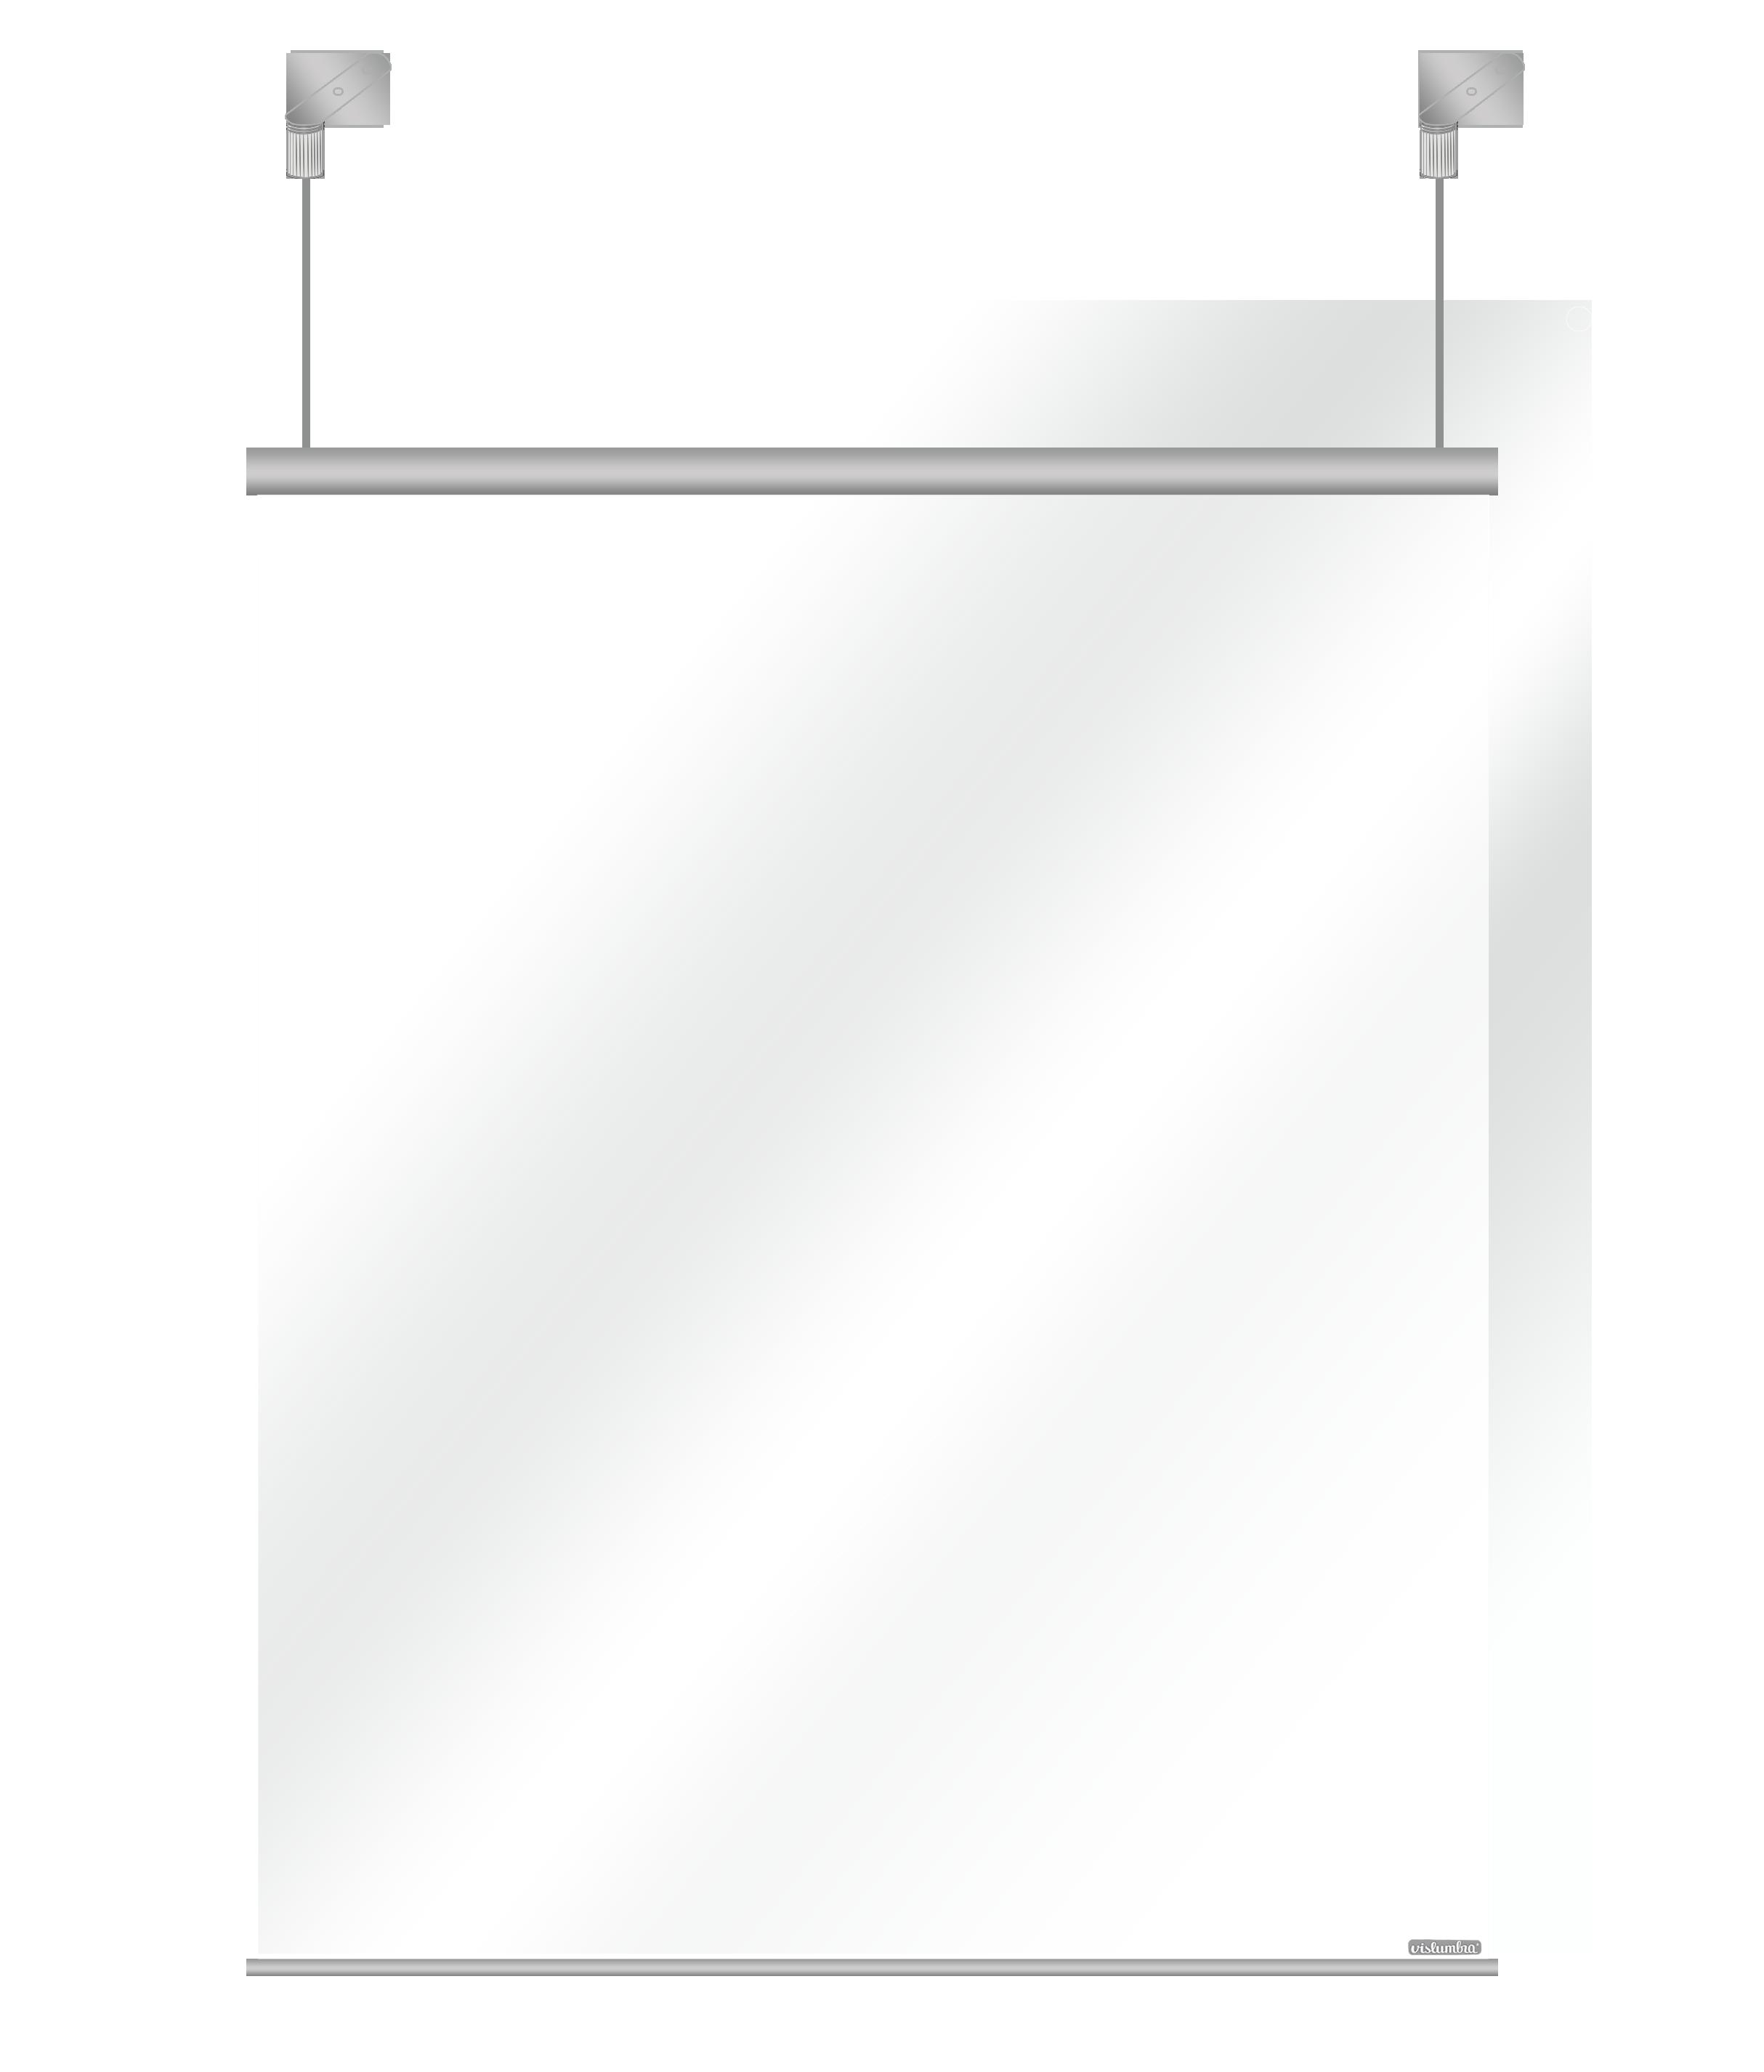 CleanGlass Vislumbra fija